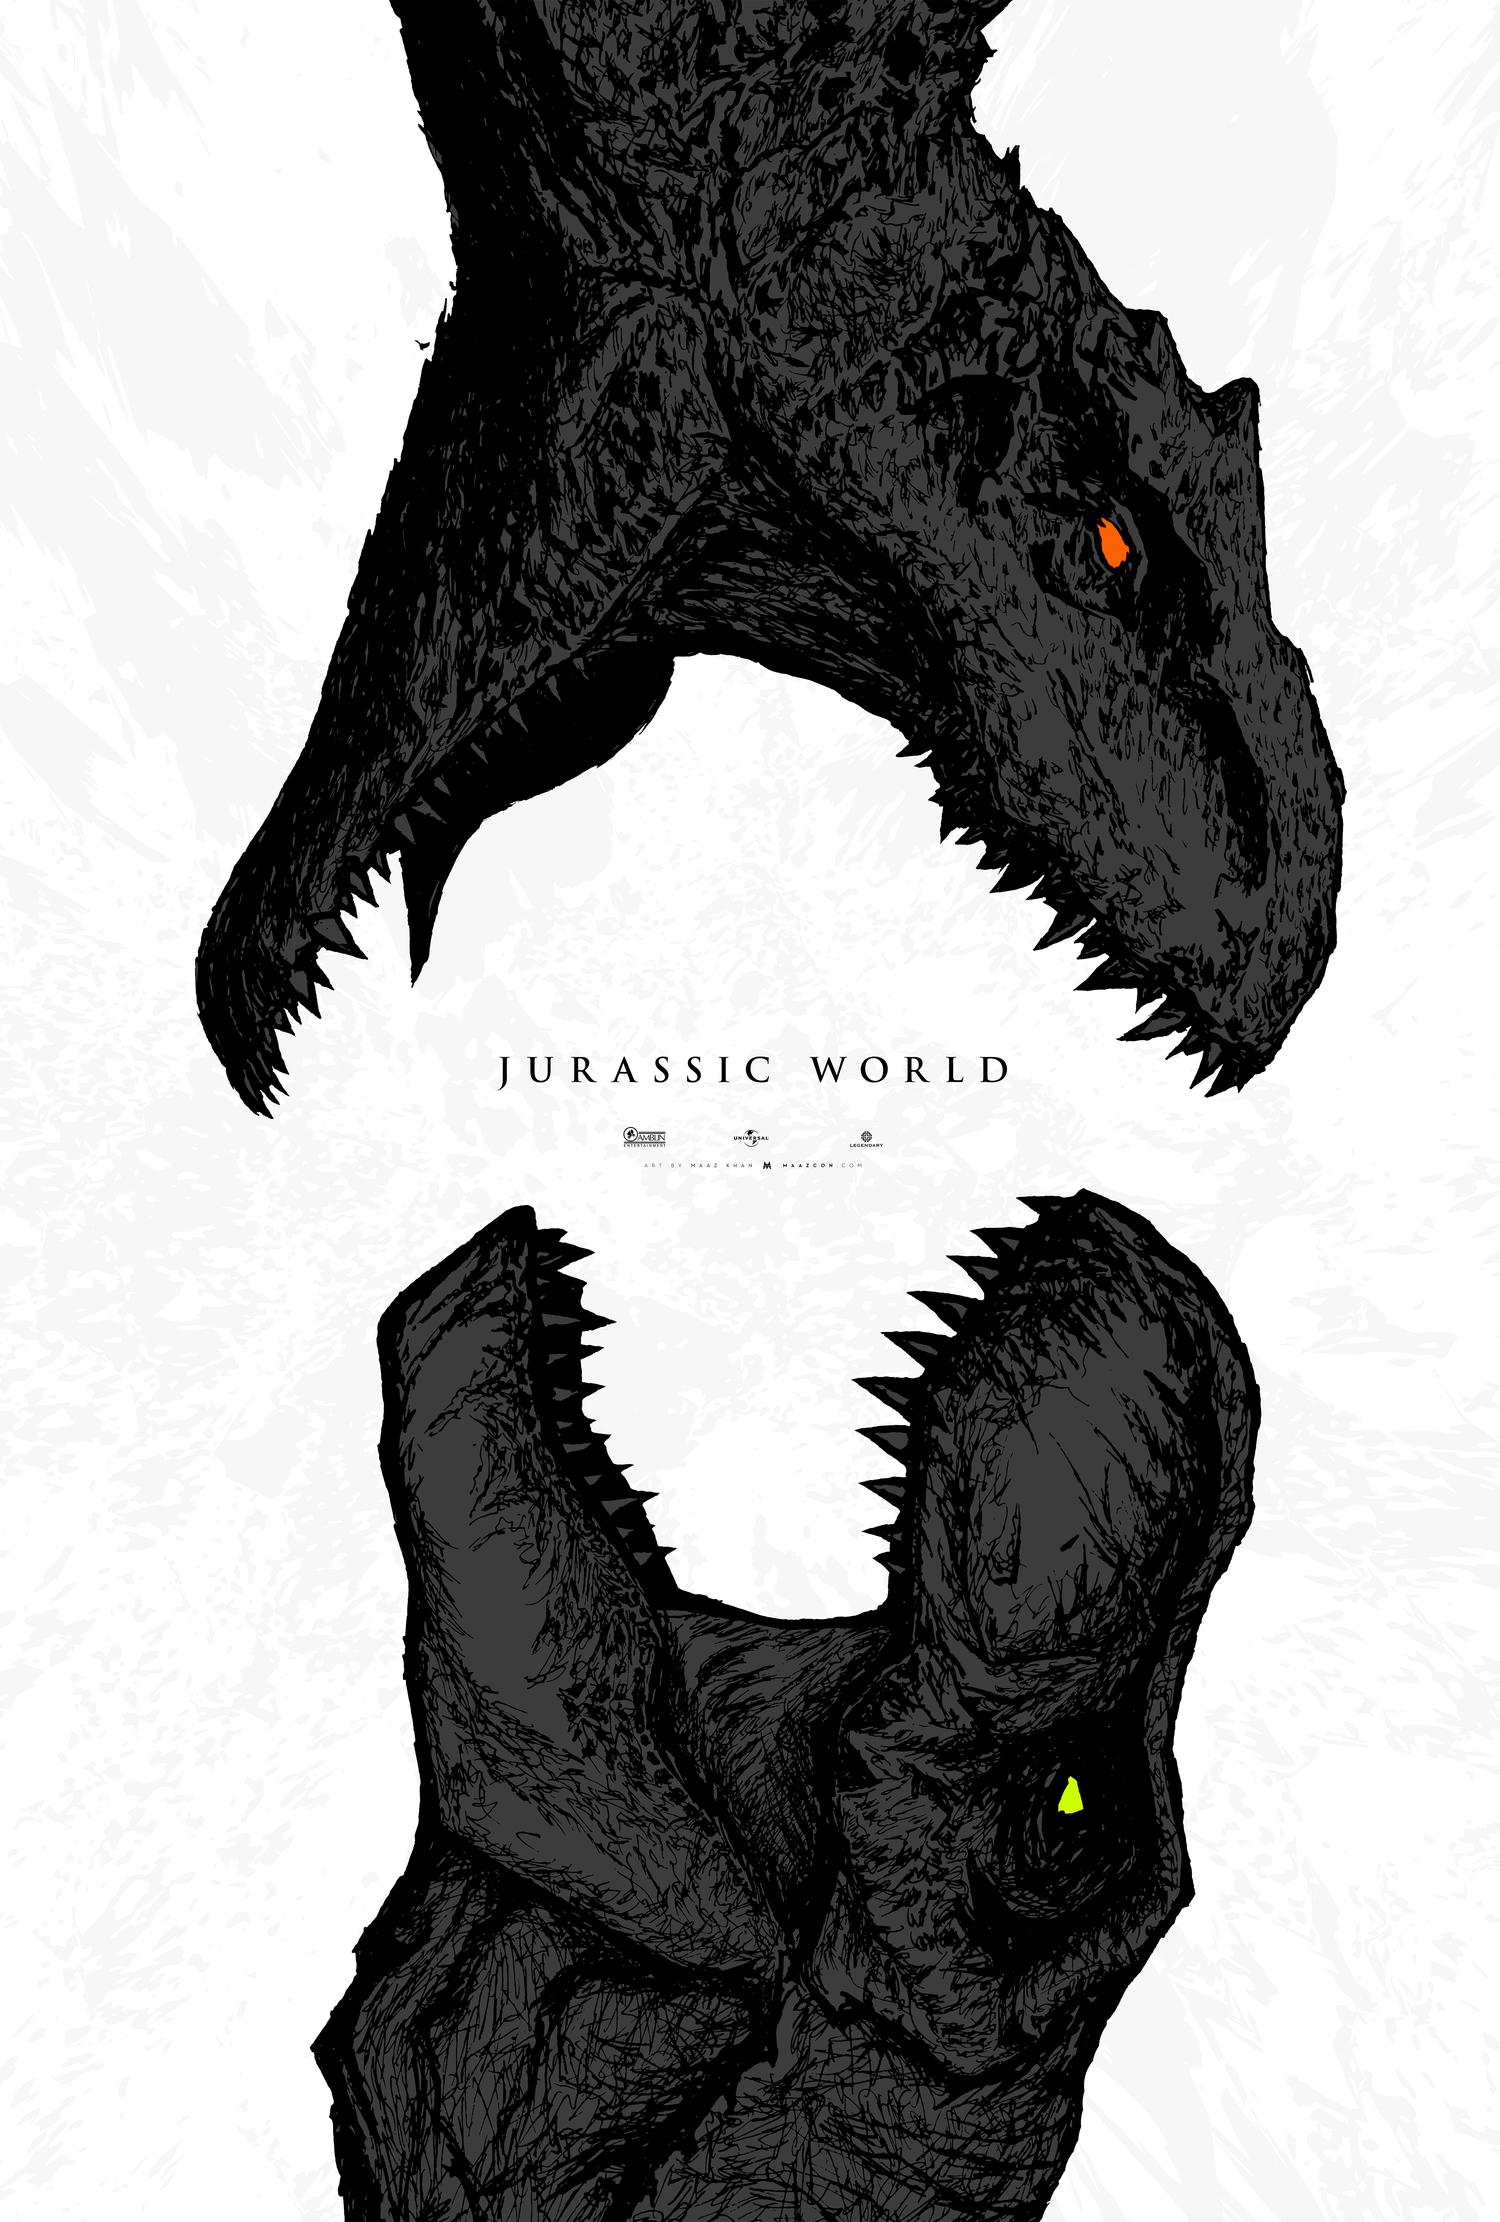 Jurassic World (1/3) [Alternate]